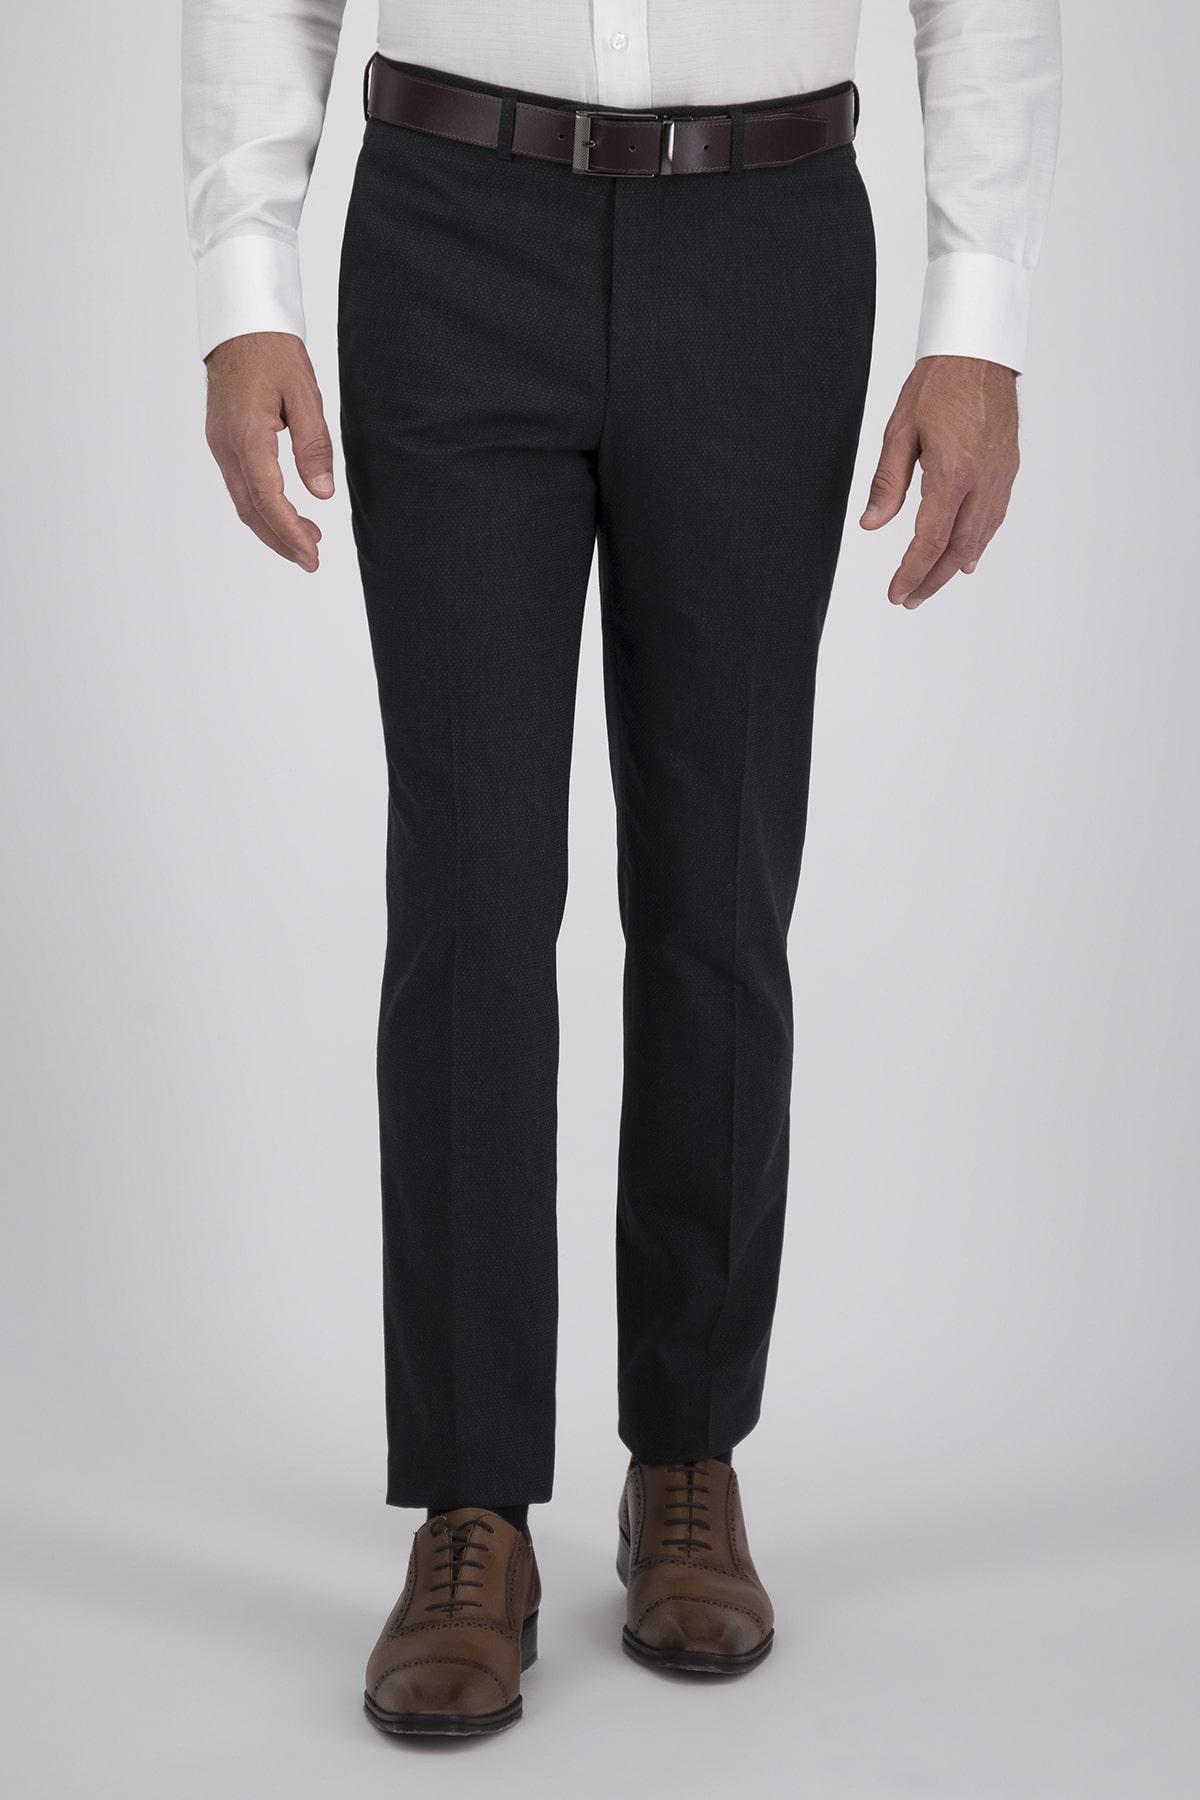 Pantalón Vestir High Life, Tejido tipo 100% Lana Negro, Corte Slim.